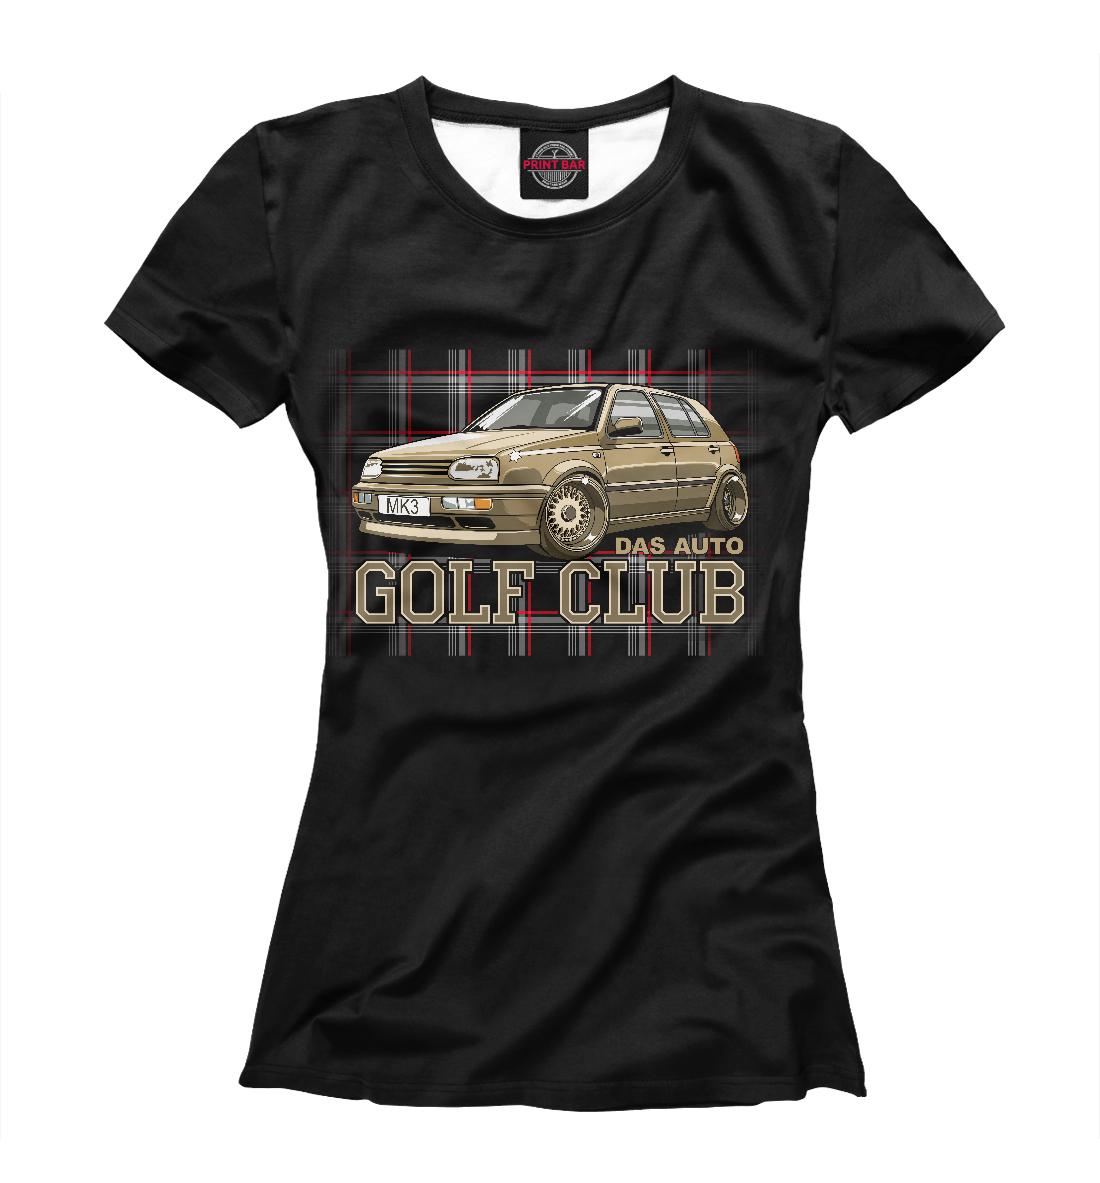 Golf mk3